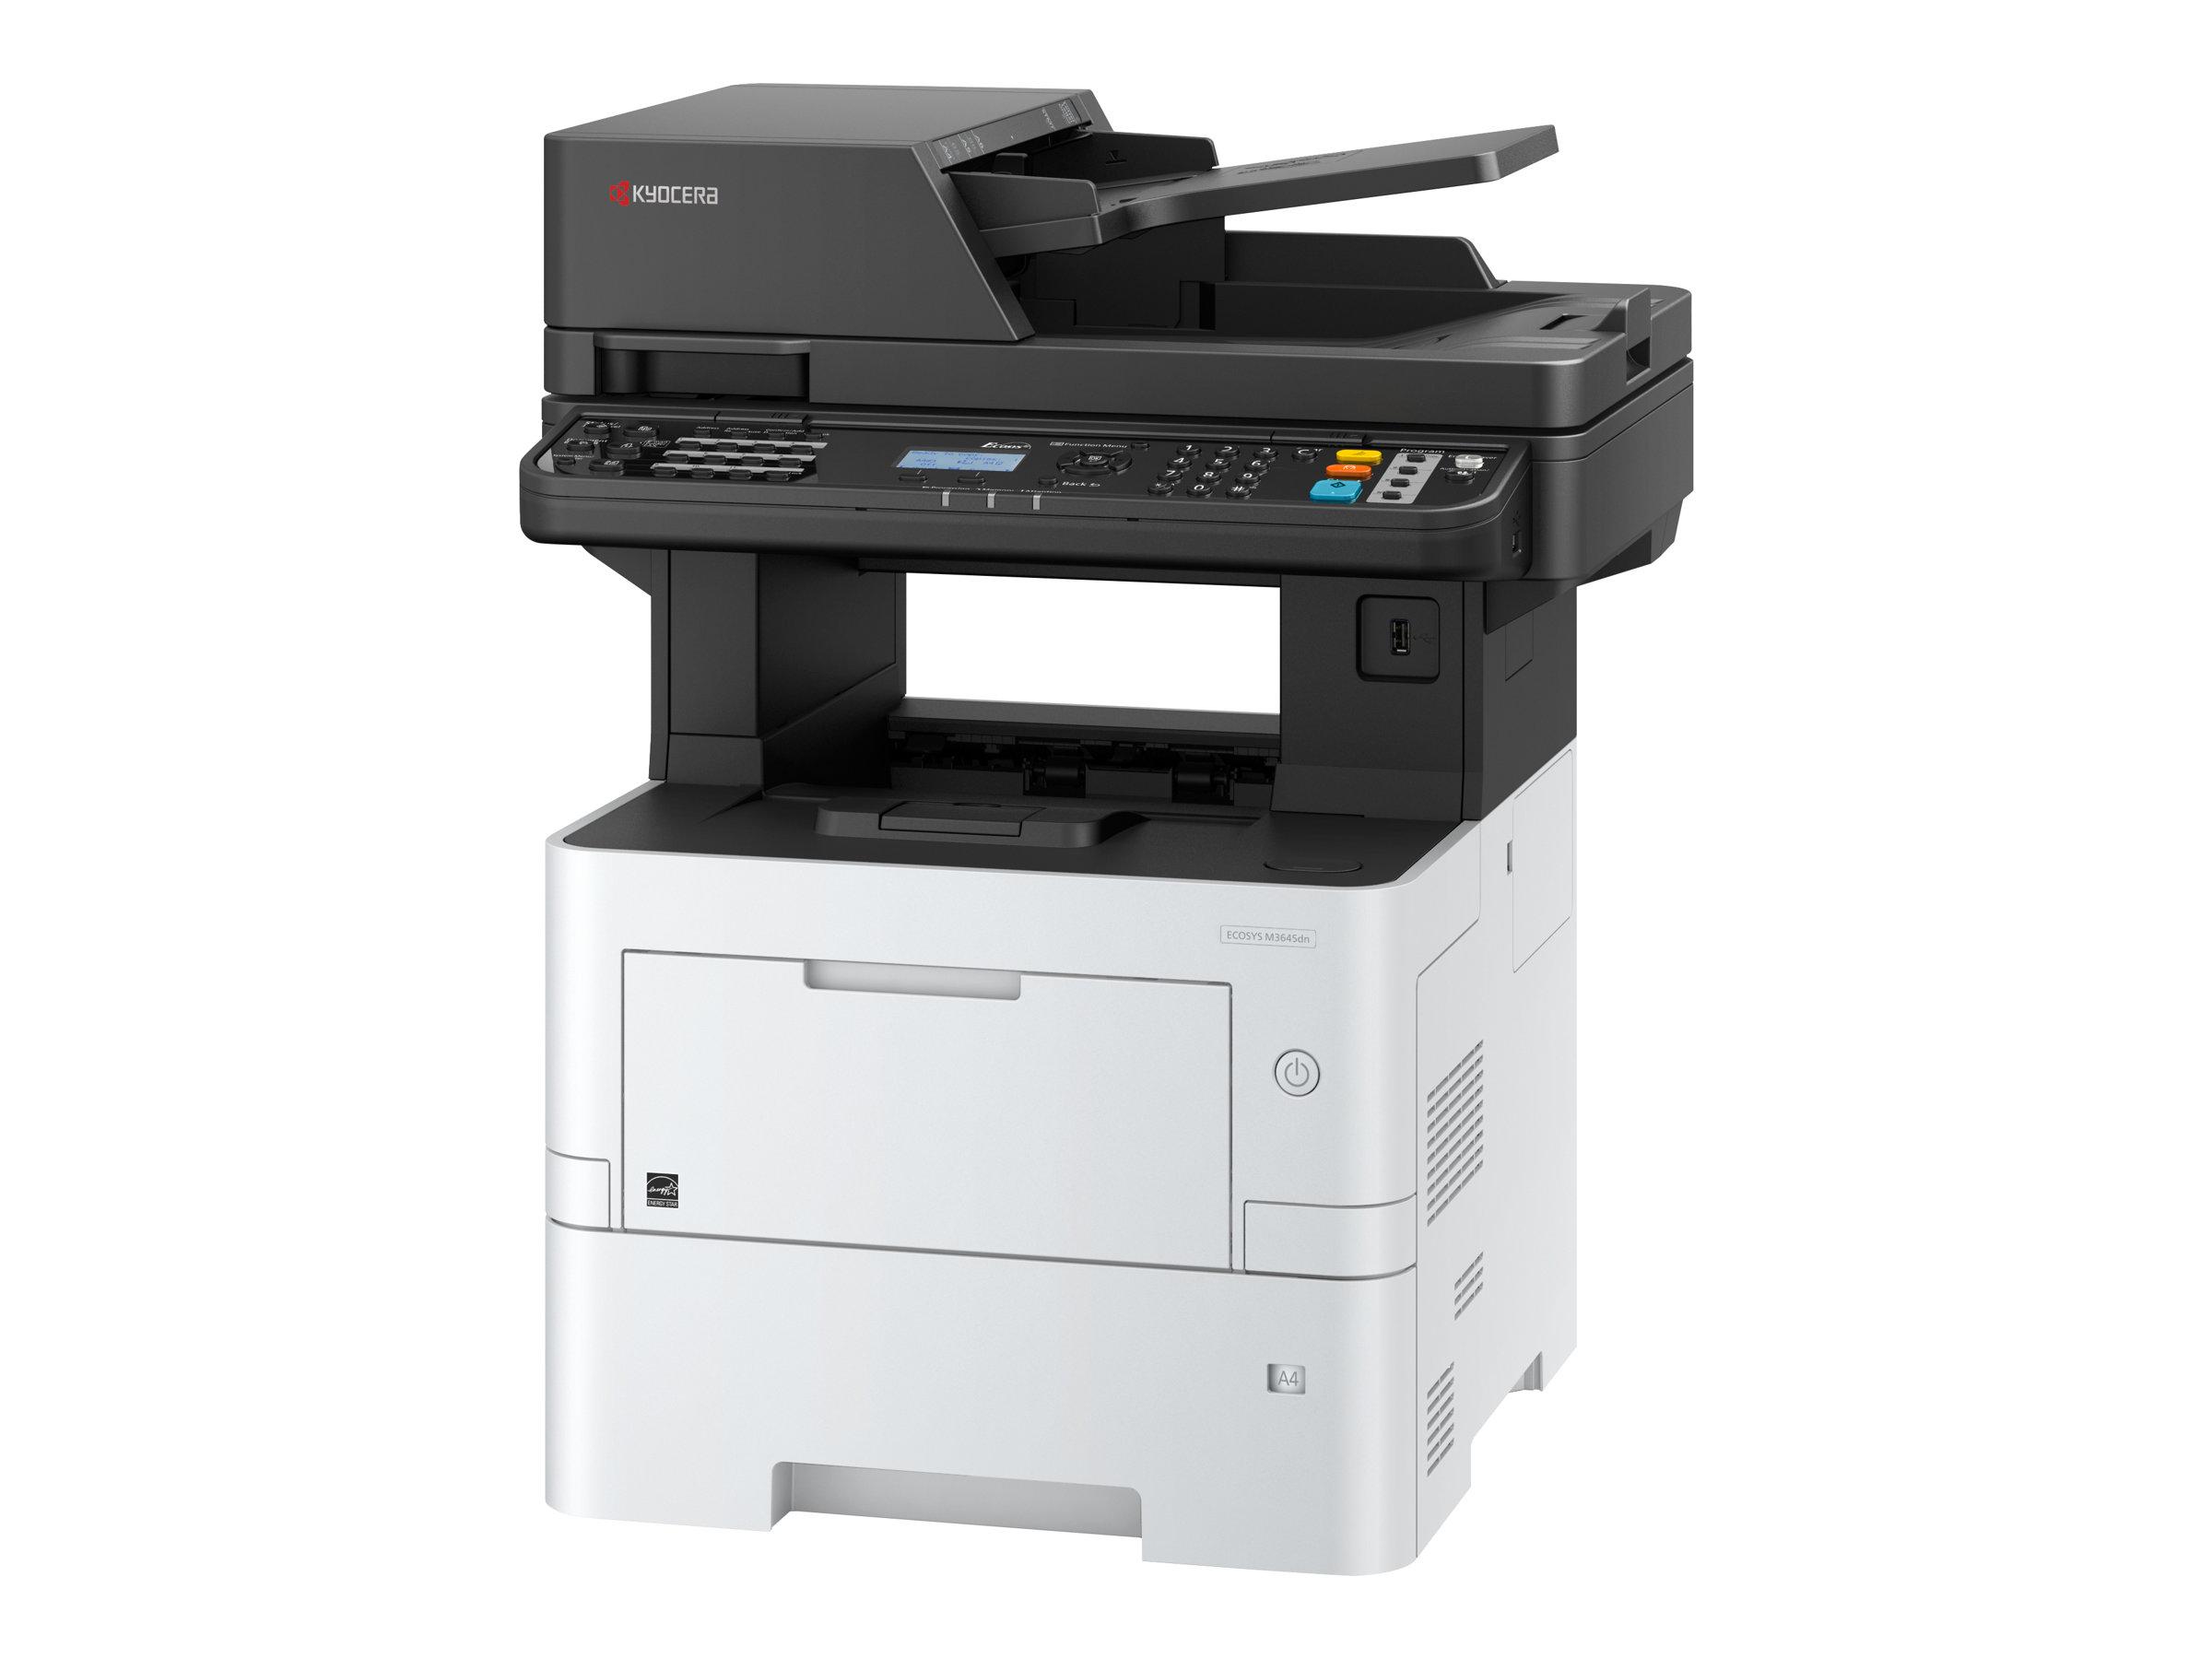 Kyocera ECOSYS M3645dn - Multifunktionsdrucker - s/w - Laser - A4 (210 x 297 mm), Legal (216 x 356 mm) (Original) - A4/Legal (Me